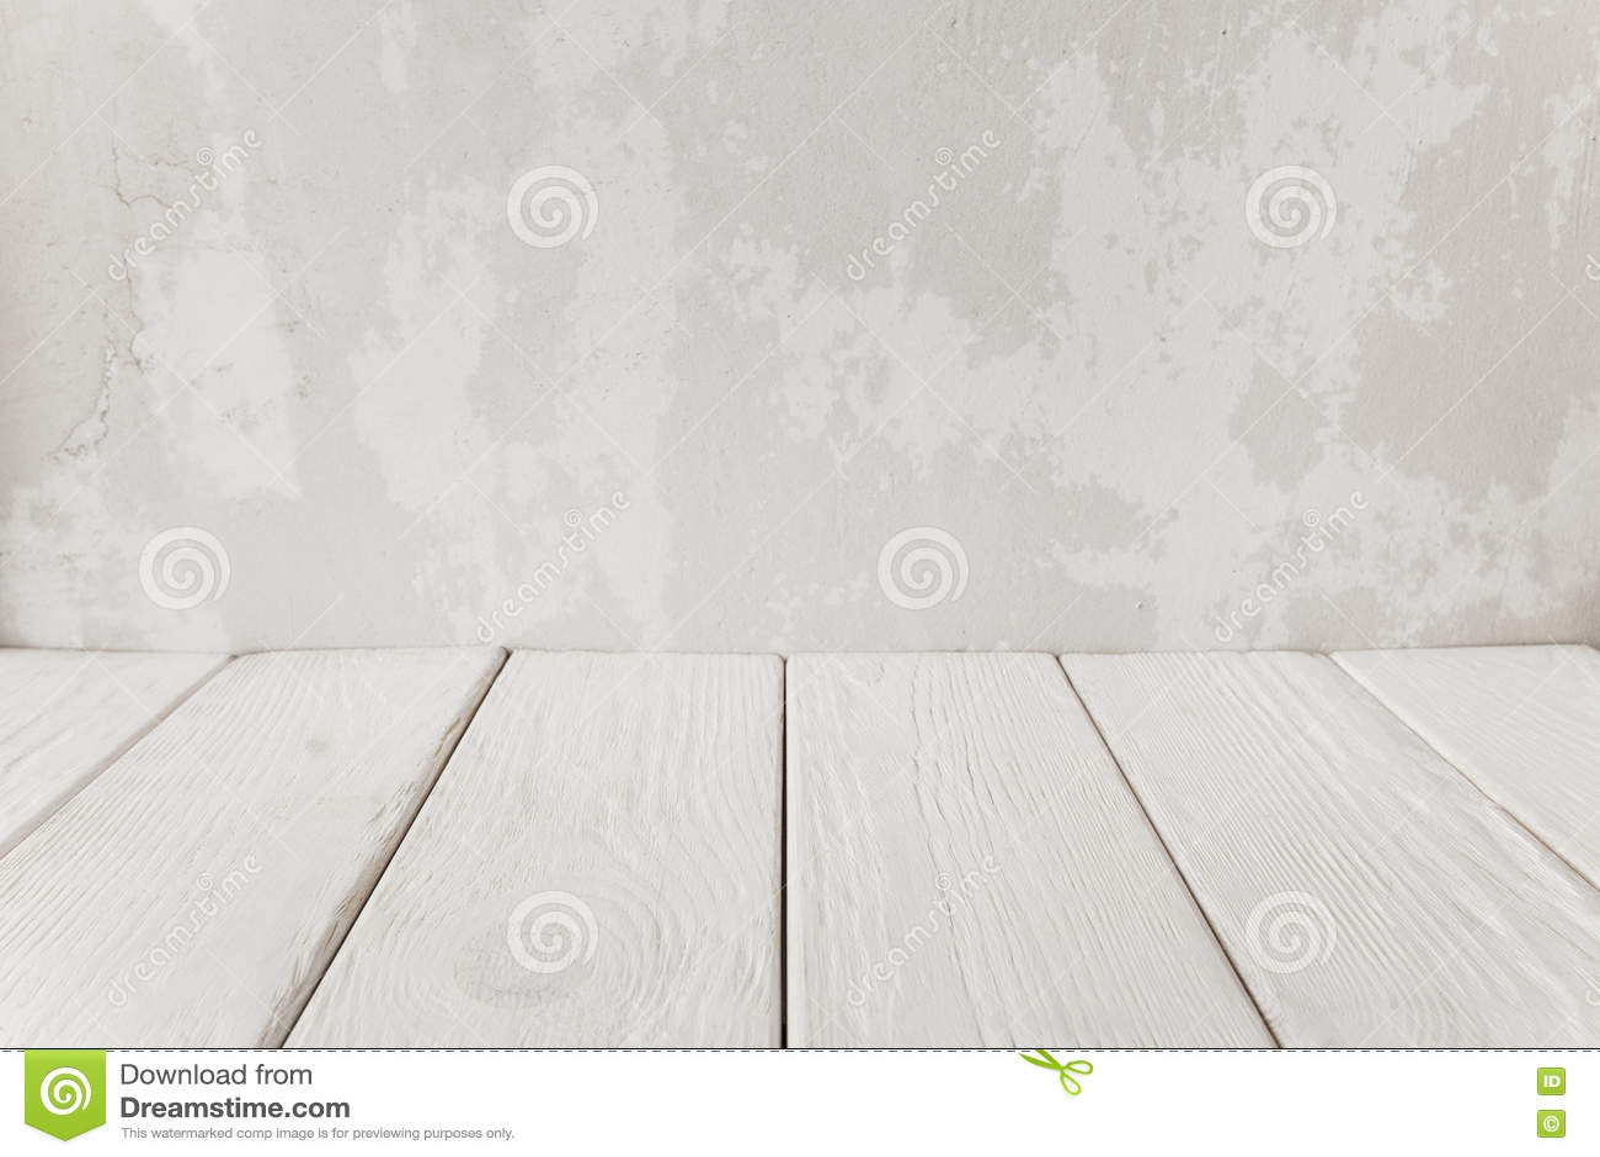 Witte Houten Vloer : Oude pleistermuur met witte houten vloer close up stock foto